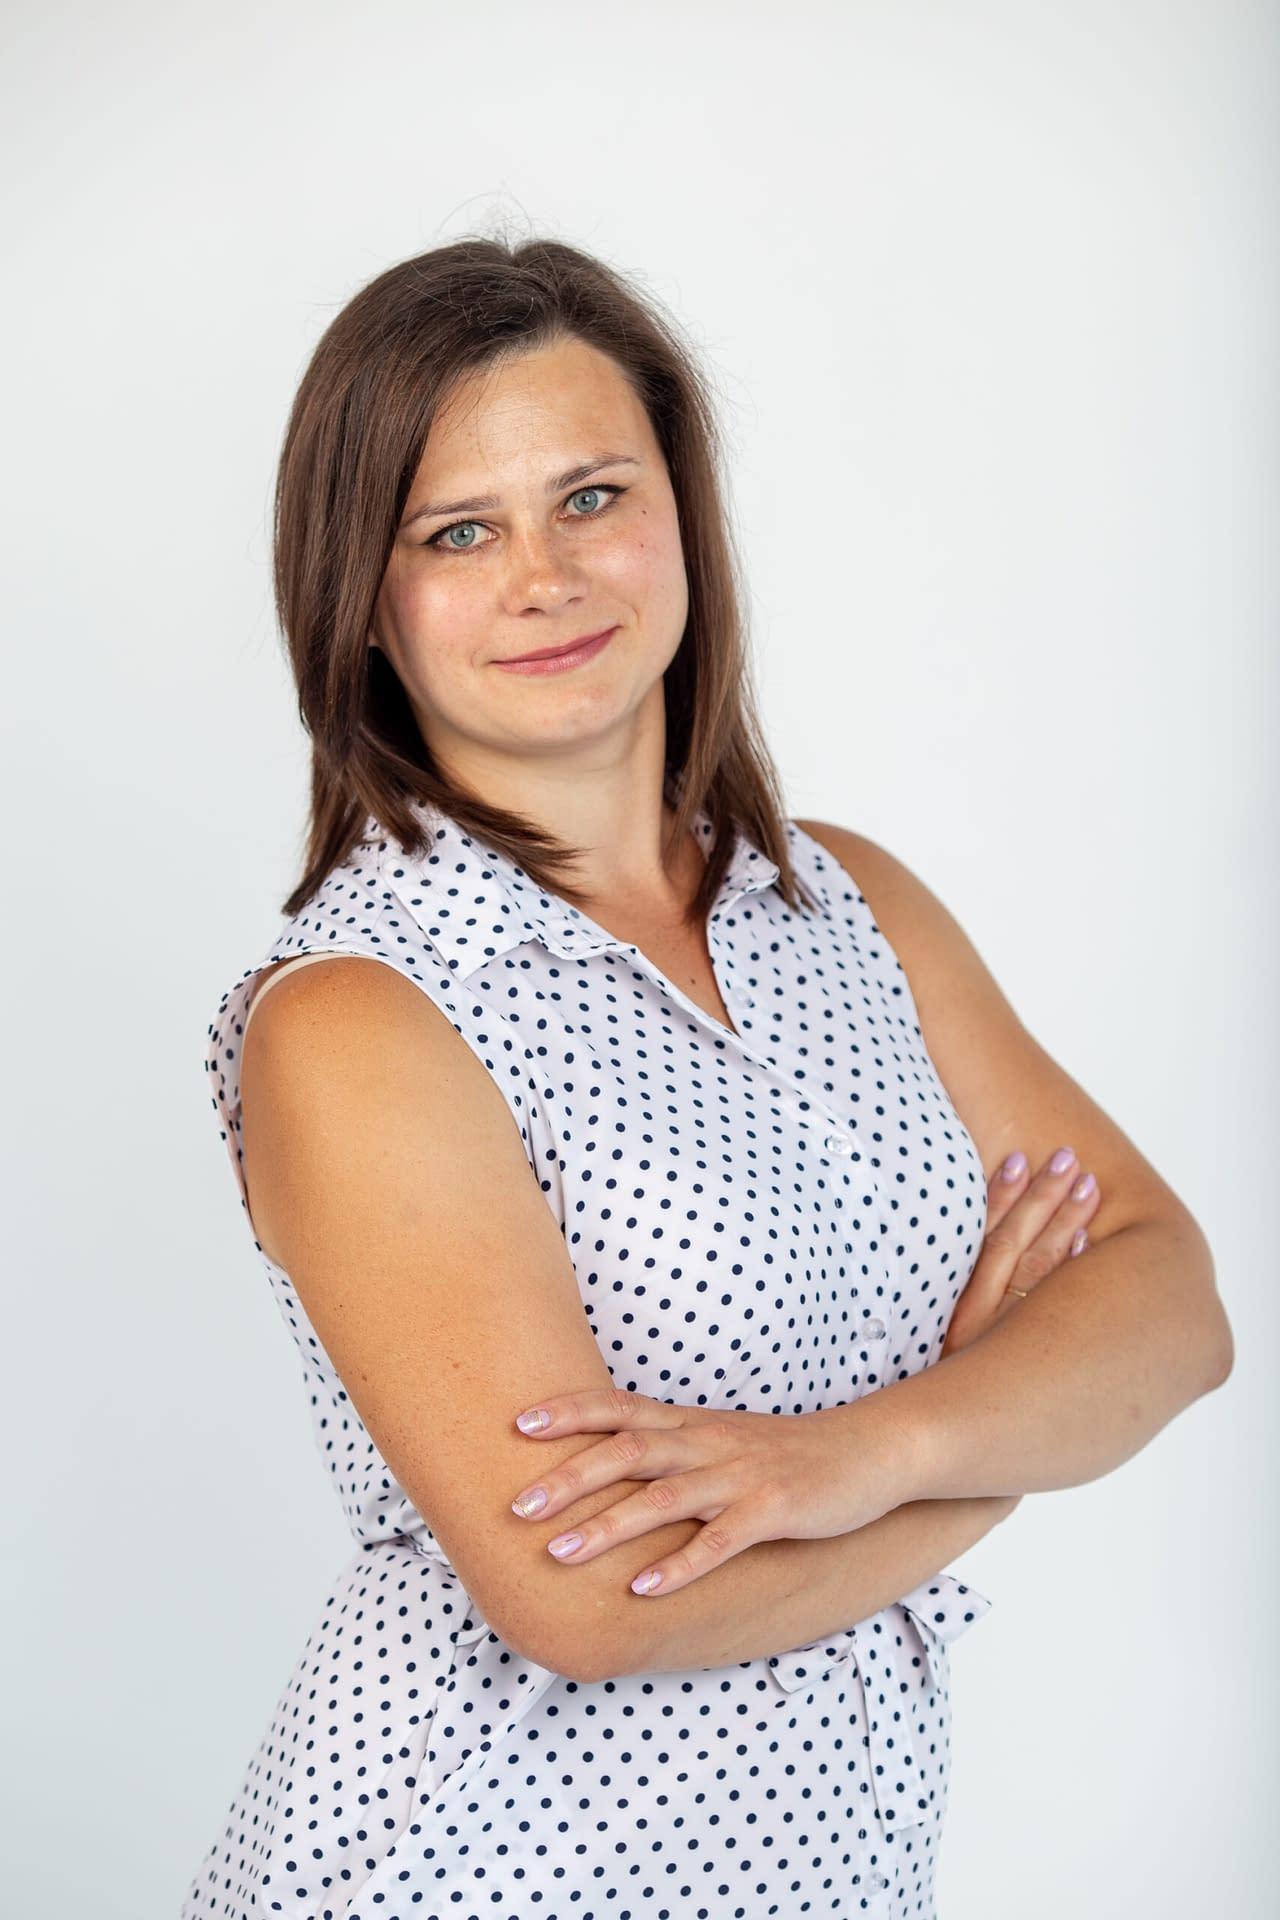 Стукалова Анастасия